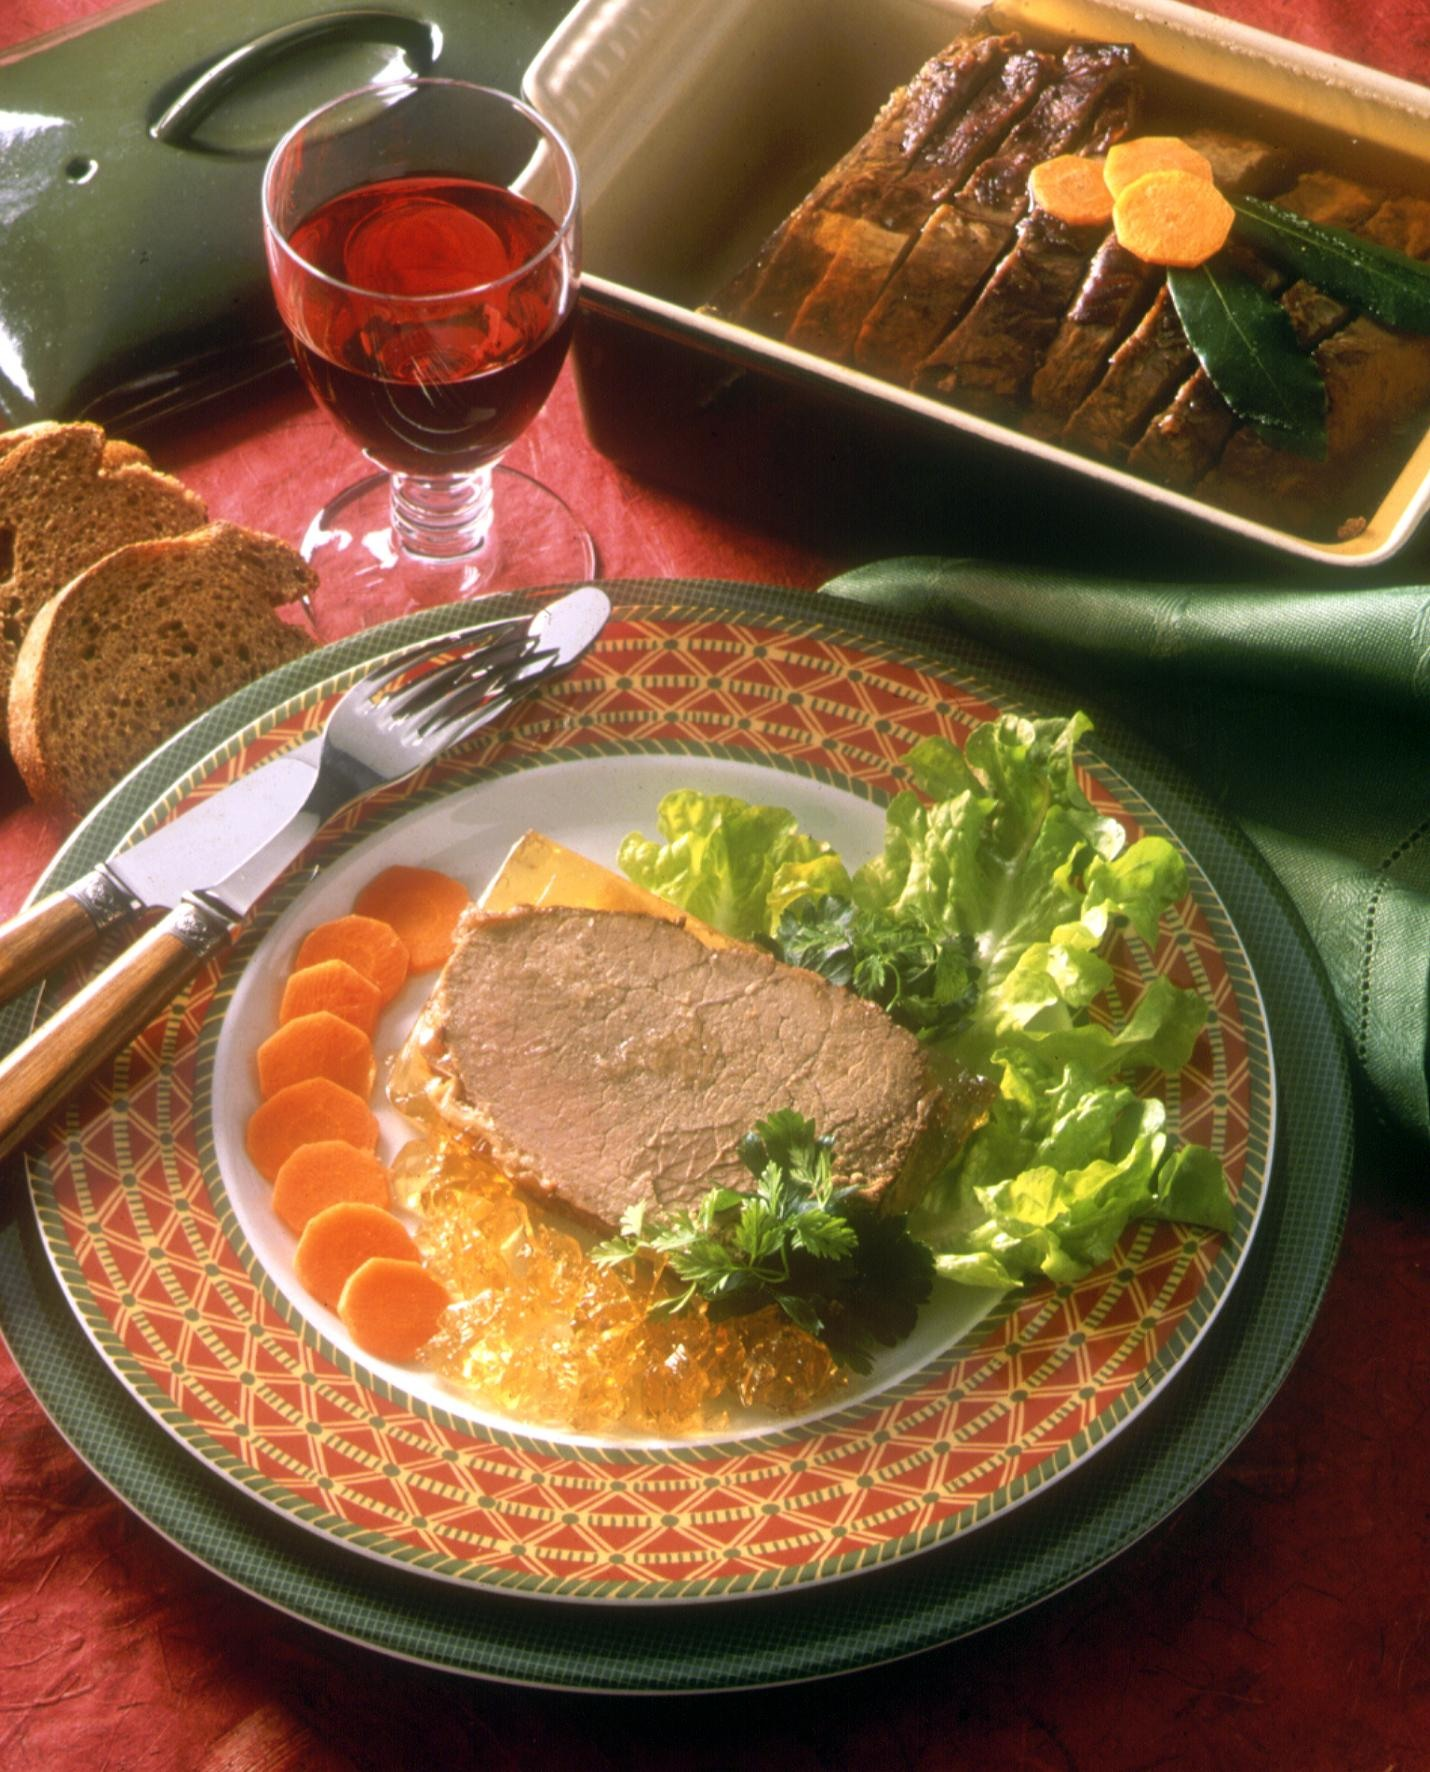 Terrine de boeuf recettes de cuisine la for Viande cuisinee